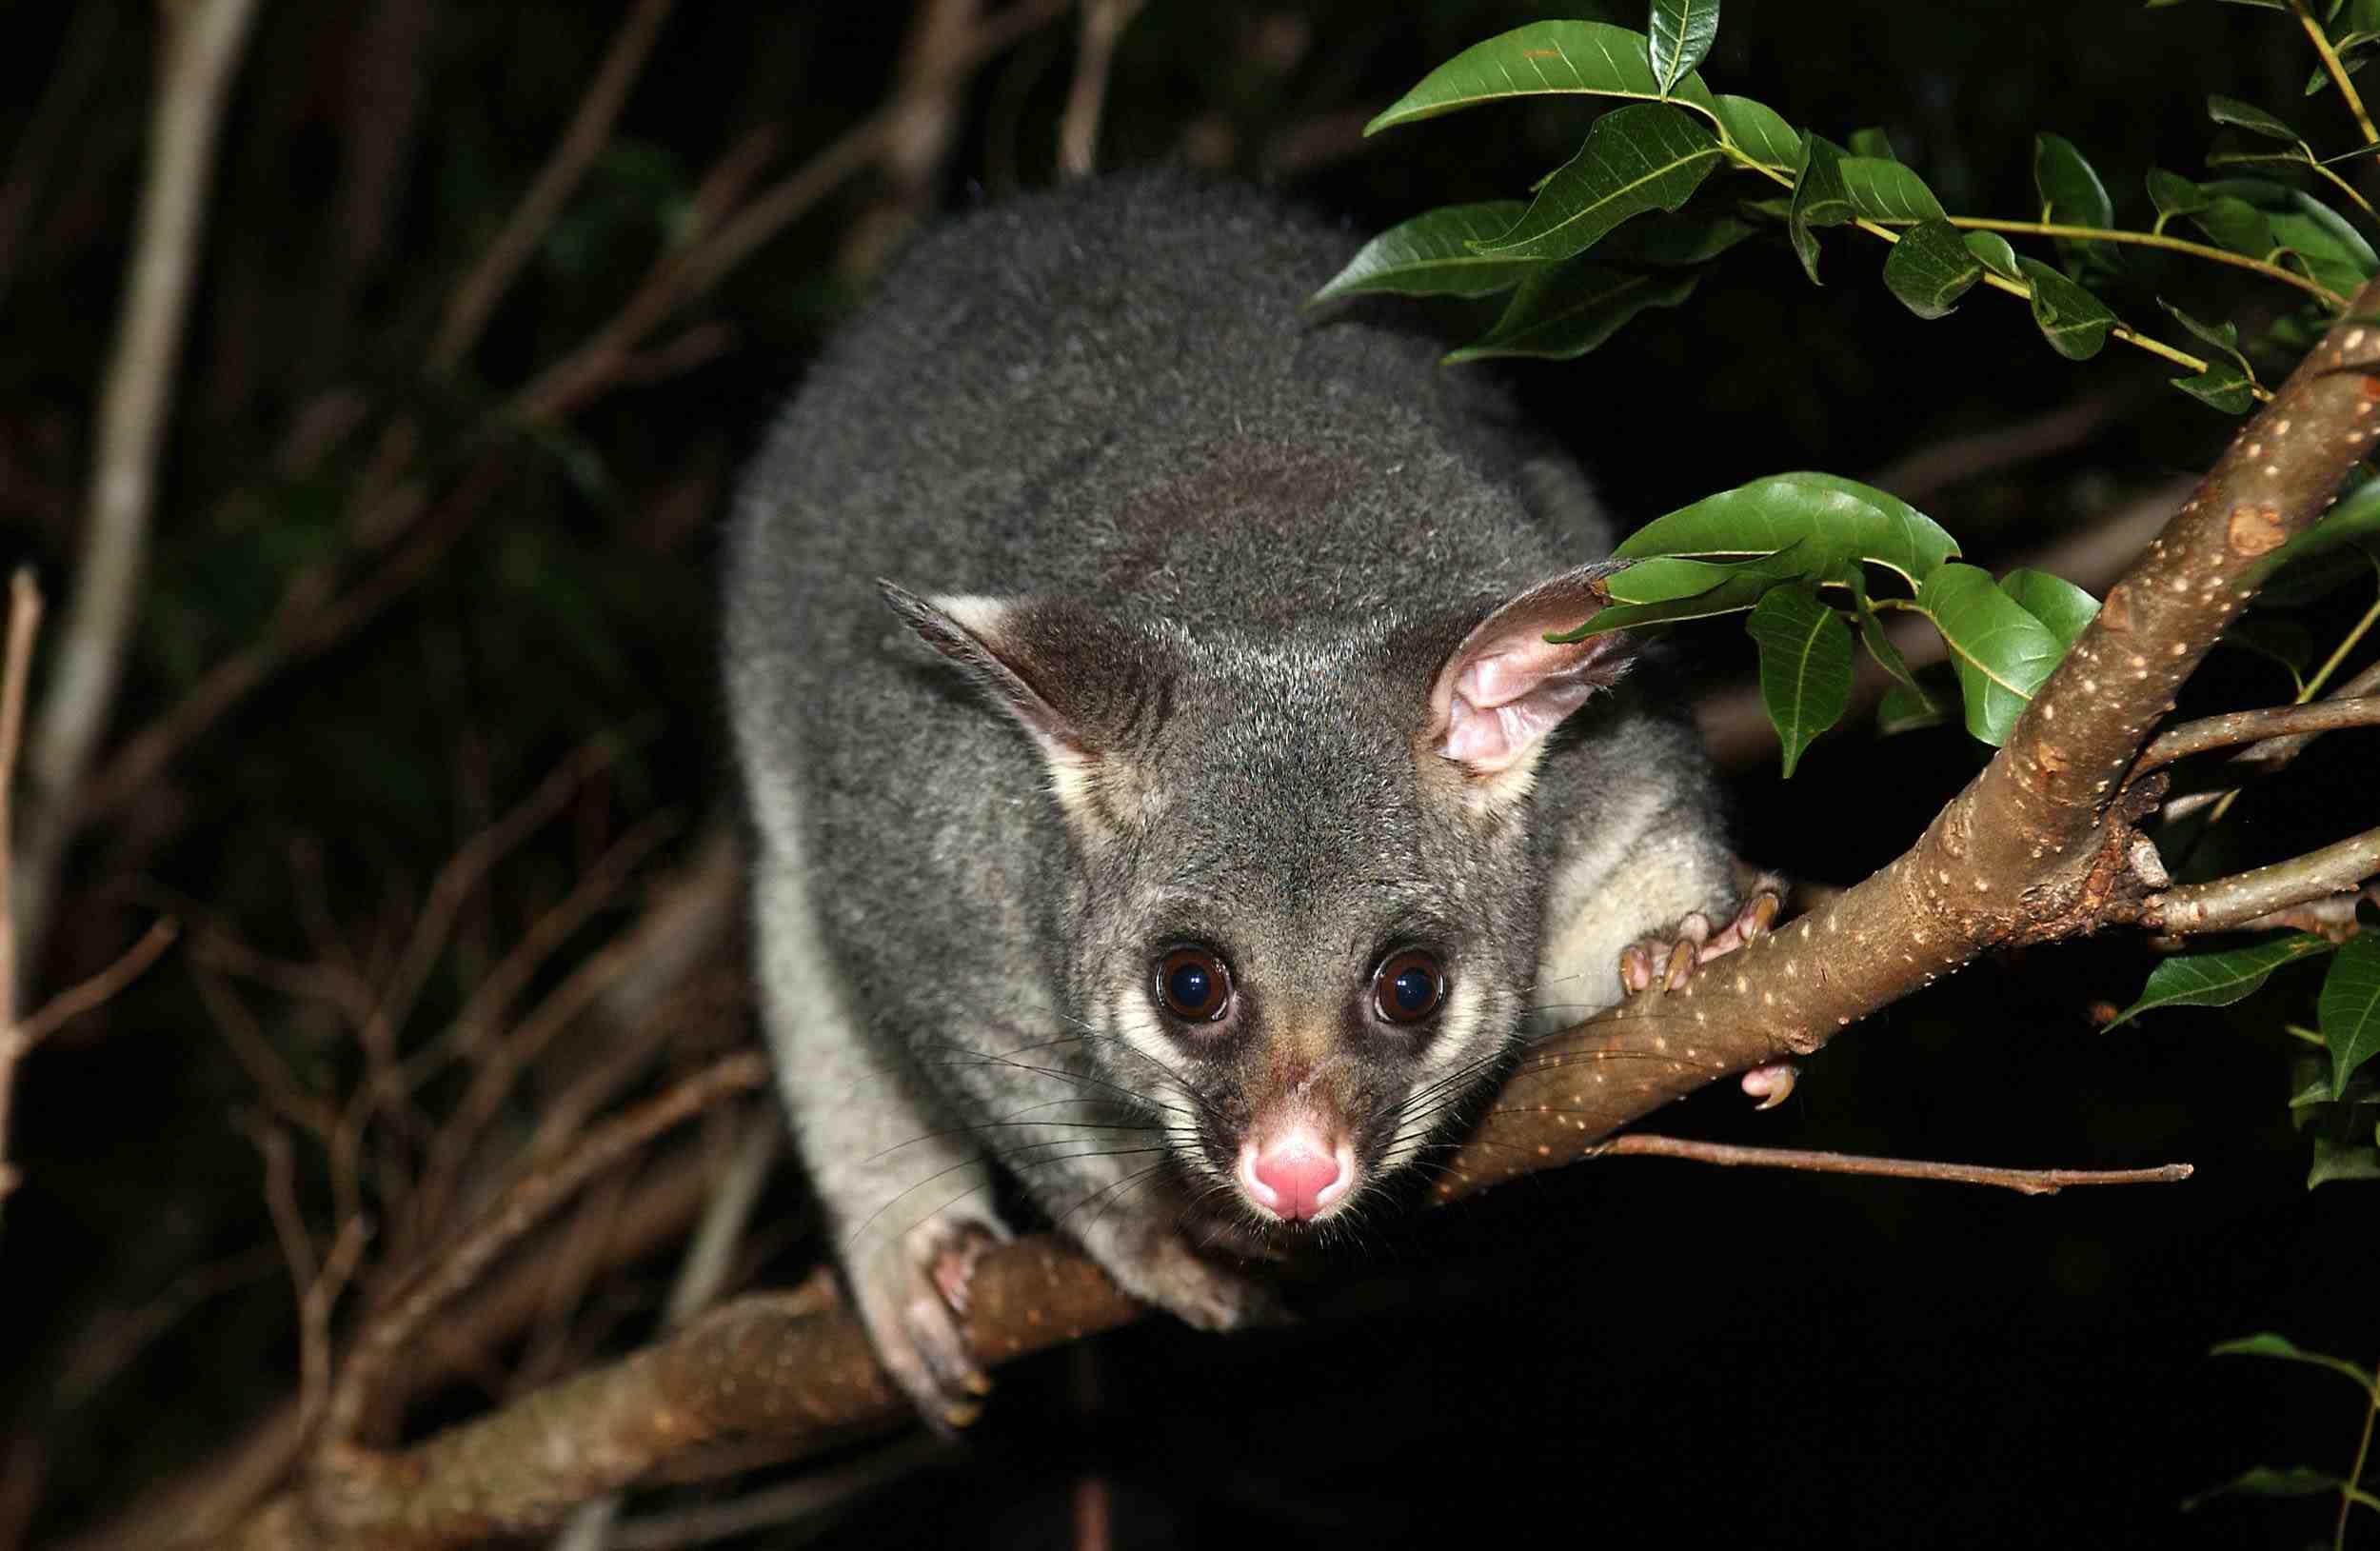 Brushtail possum in its natural Australian habitat